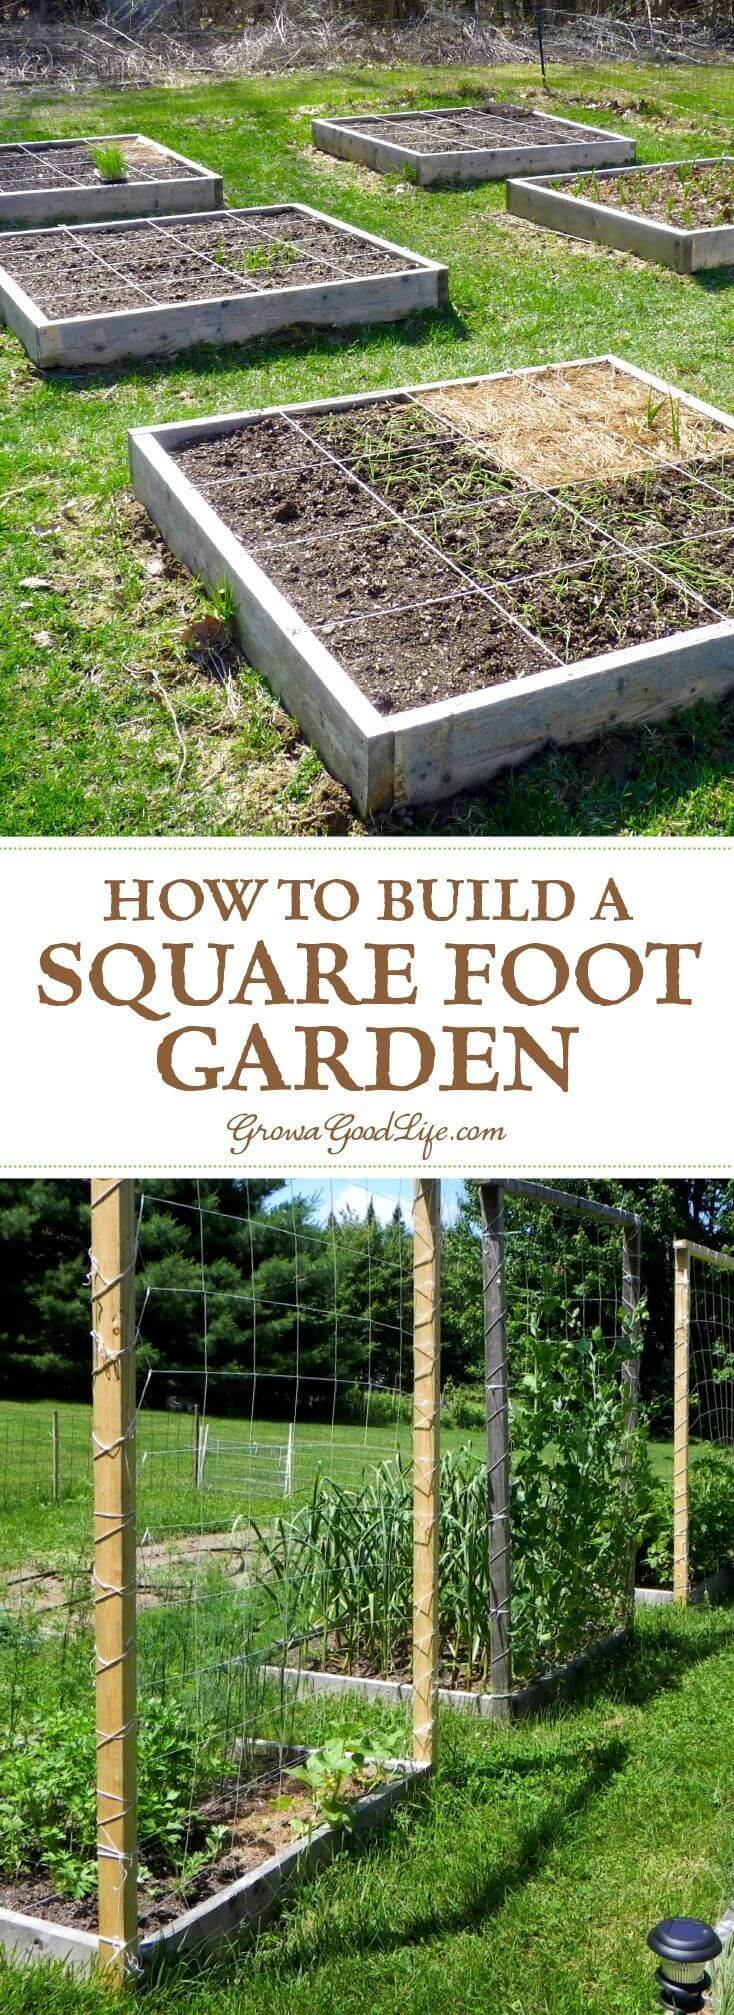 Climbing Lattice for Raised Garden Beds